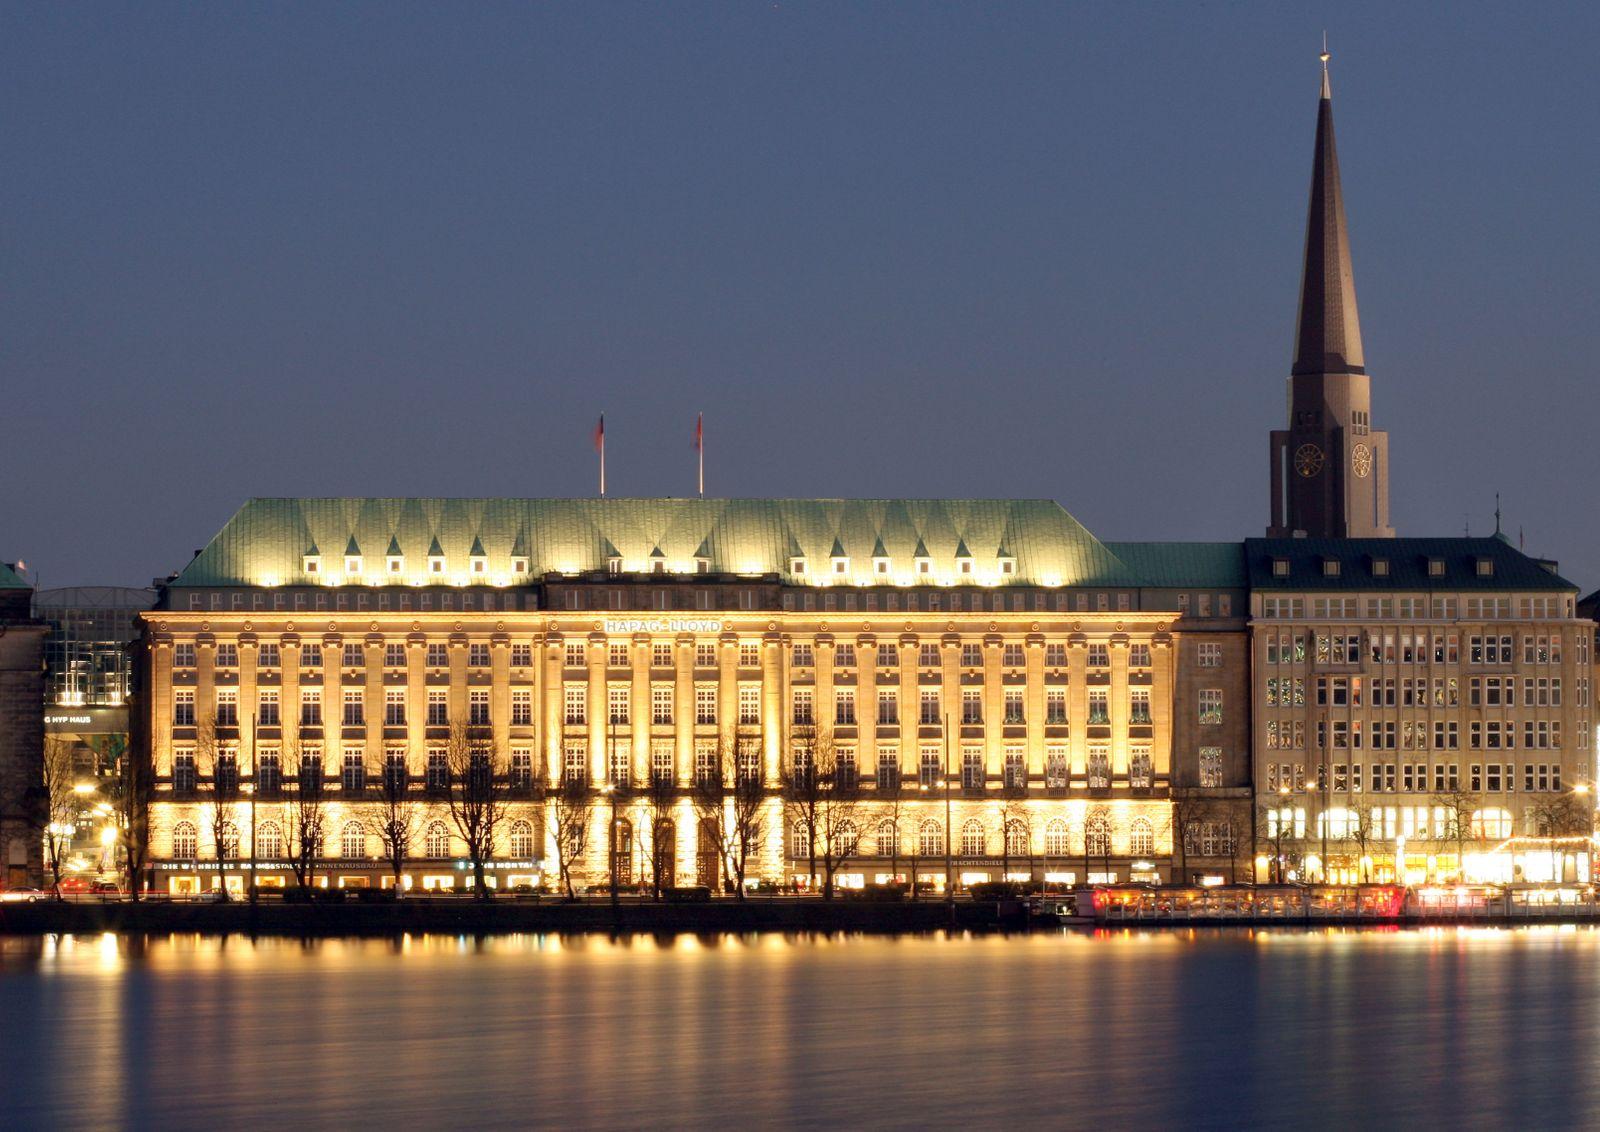 Hapag-Lloyd-Stammsitz in Hamburg